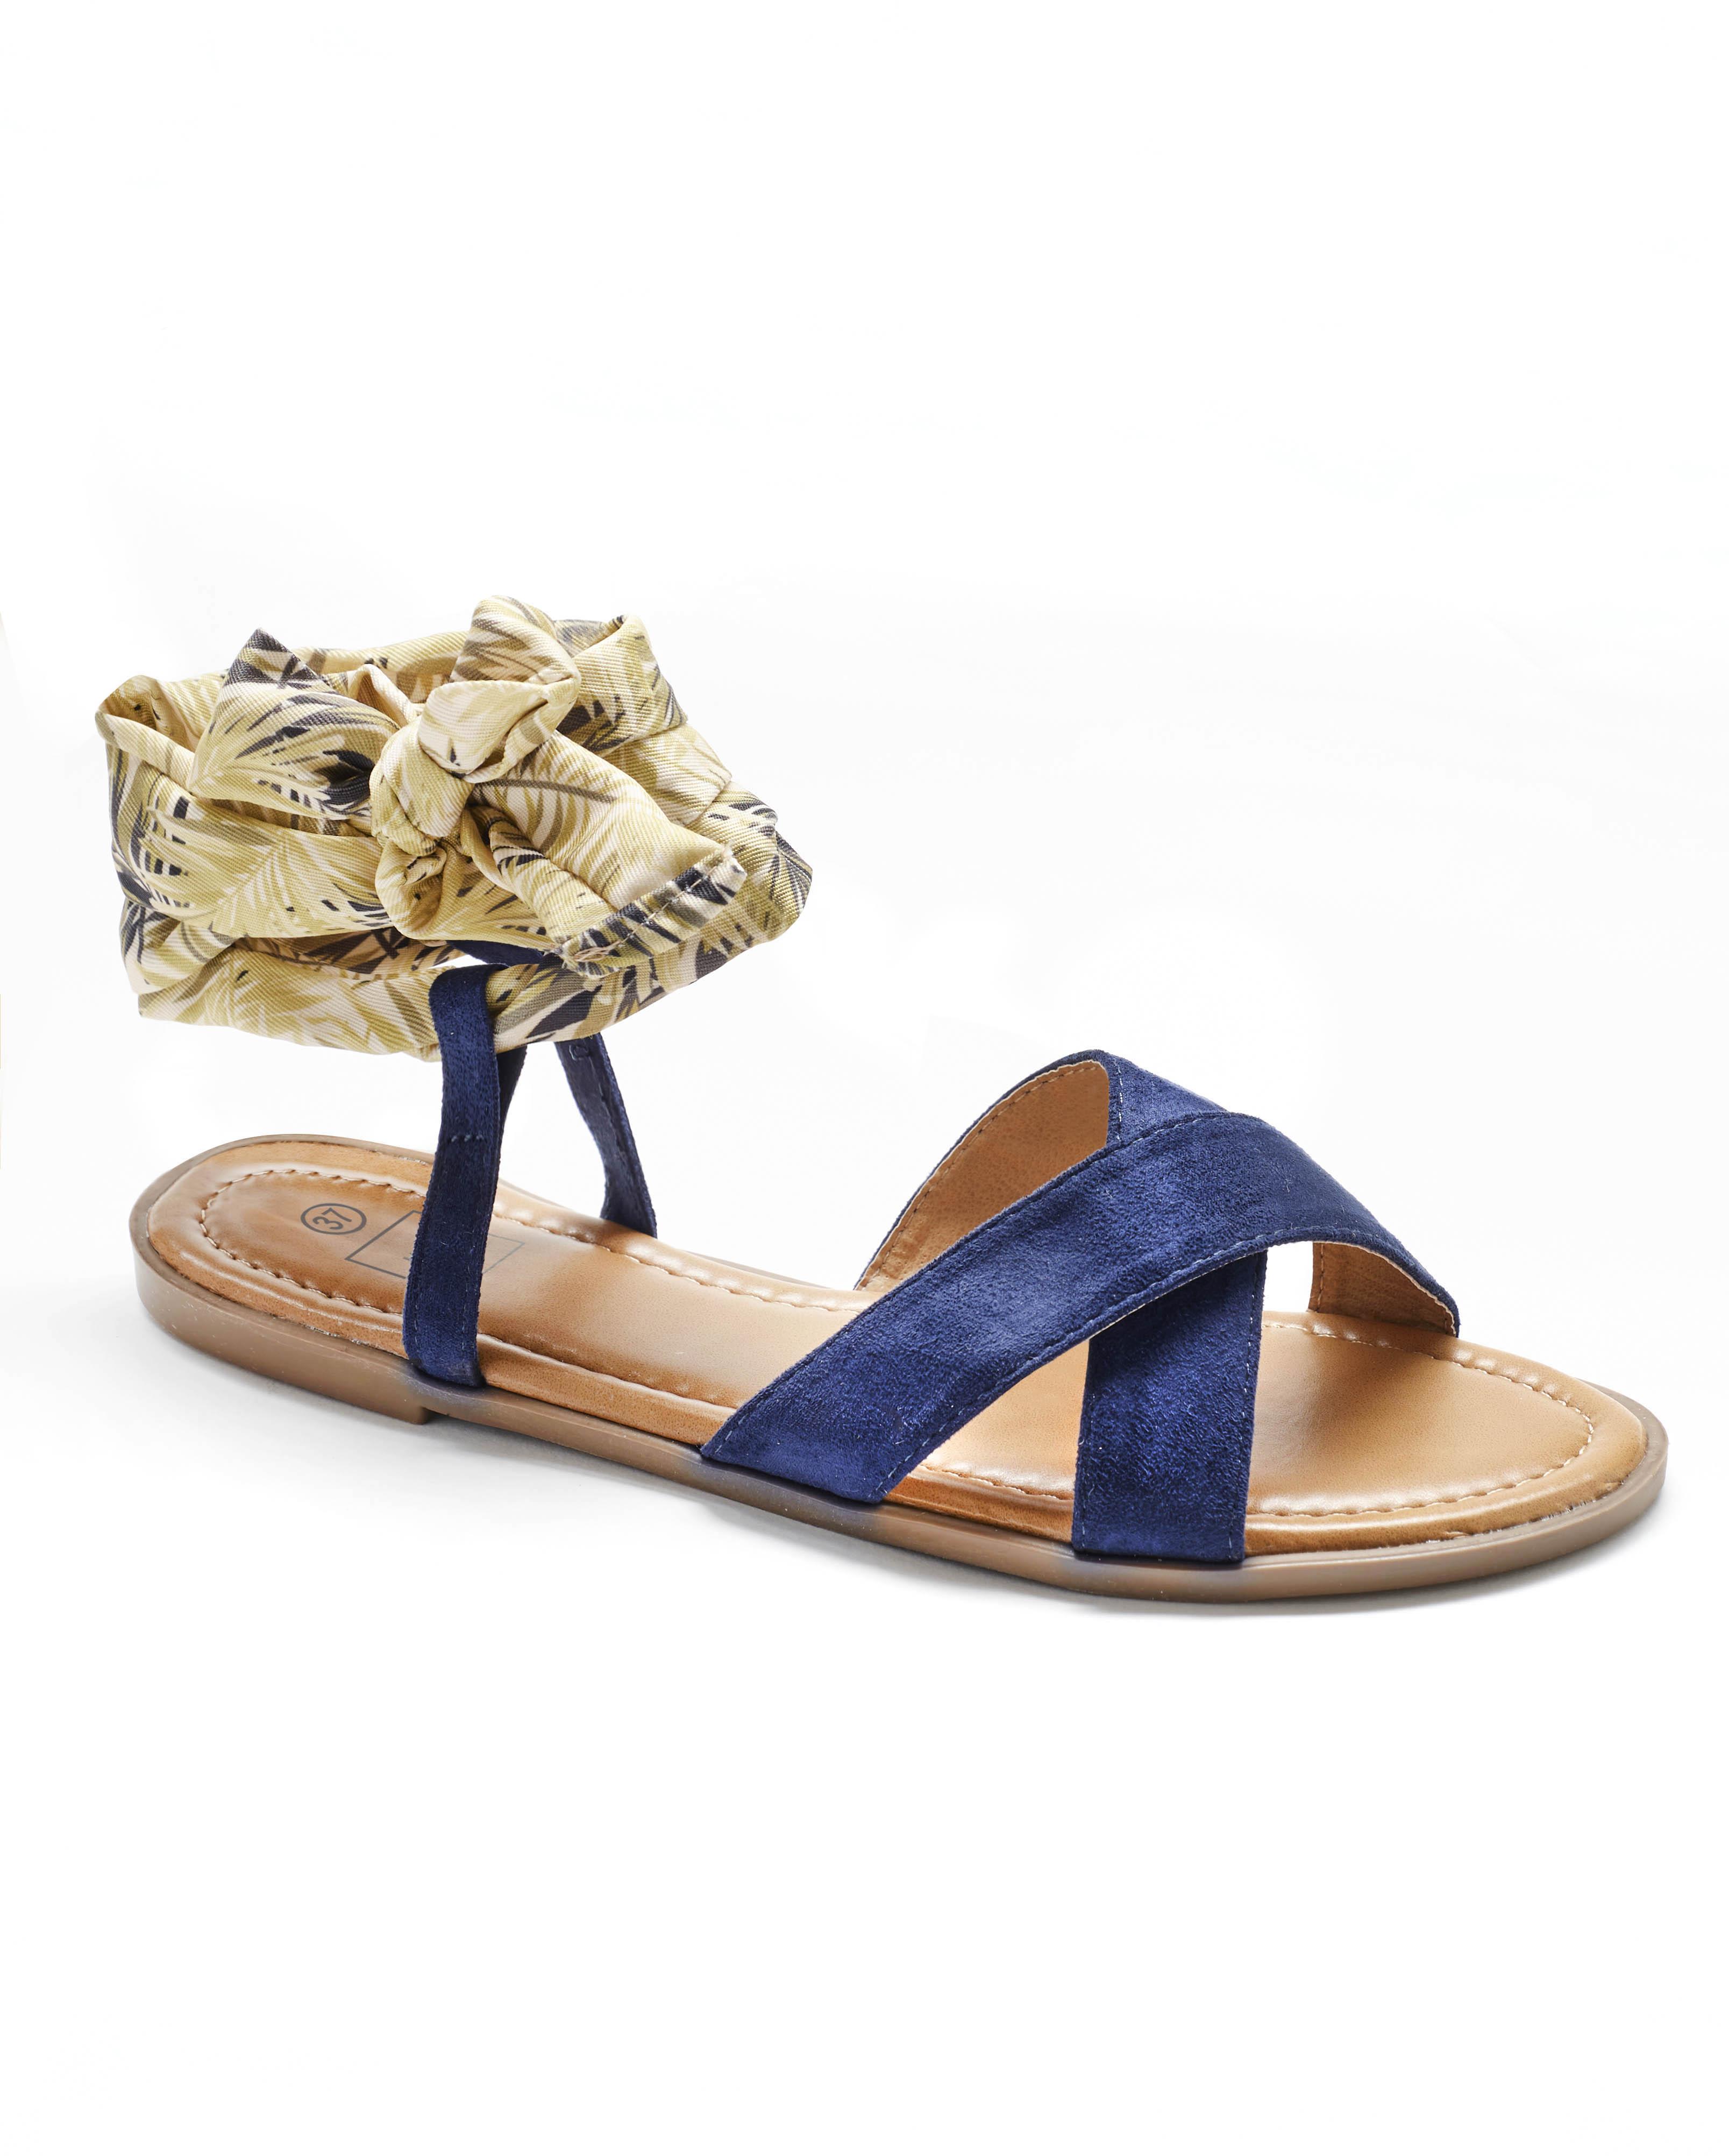 Sandales Plates Femme - Sandale Plate Marine Jina - Style 2 Zh 2021